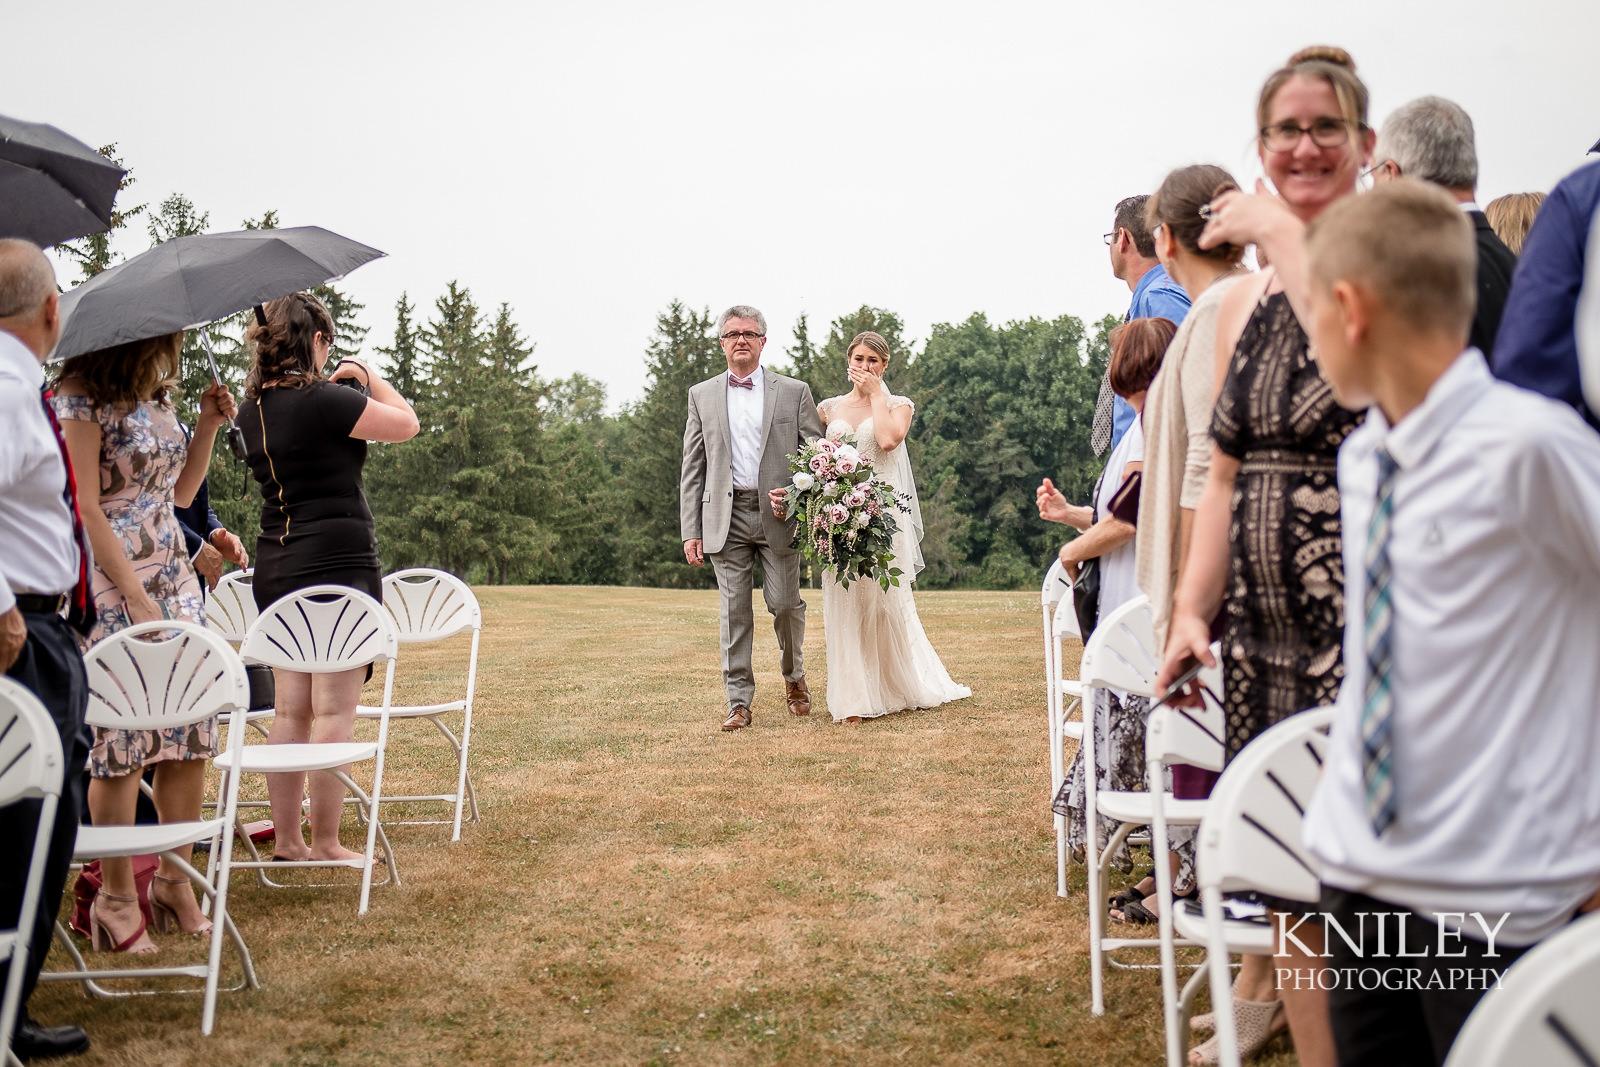 041 - Ontario Golf Club Wedding Pictures - XT2B8197.jpg